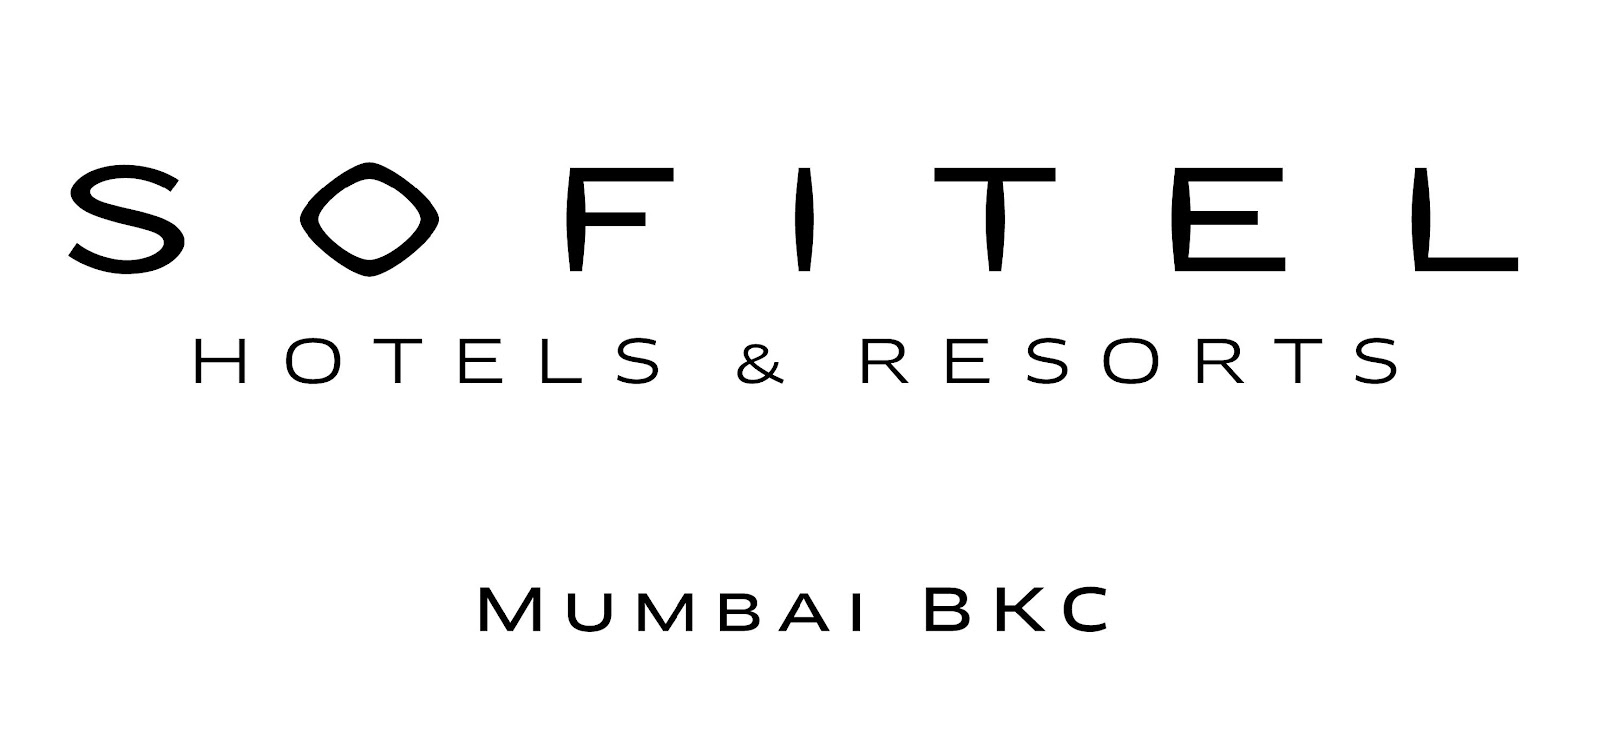 T:\Varsha\SMBKC\Sofitel Mumbai BKC_Logos_PDF\Sofitel Mumbai BKC - Logo.jpg